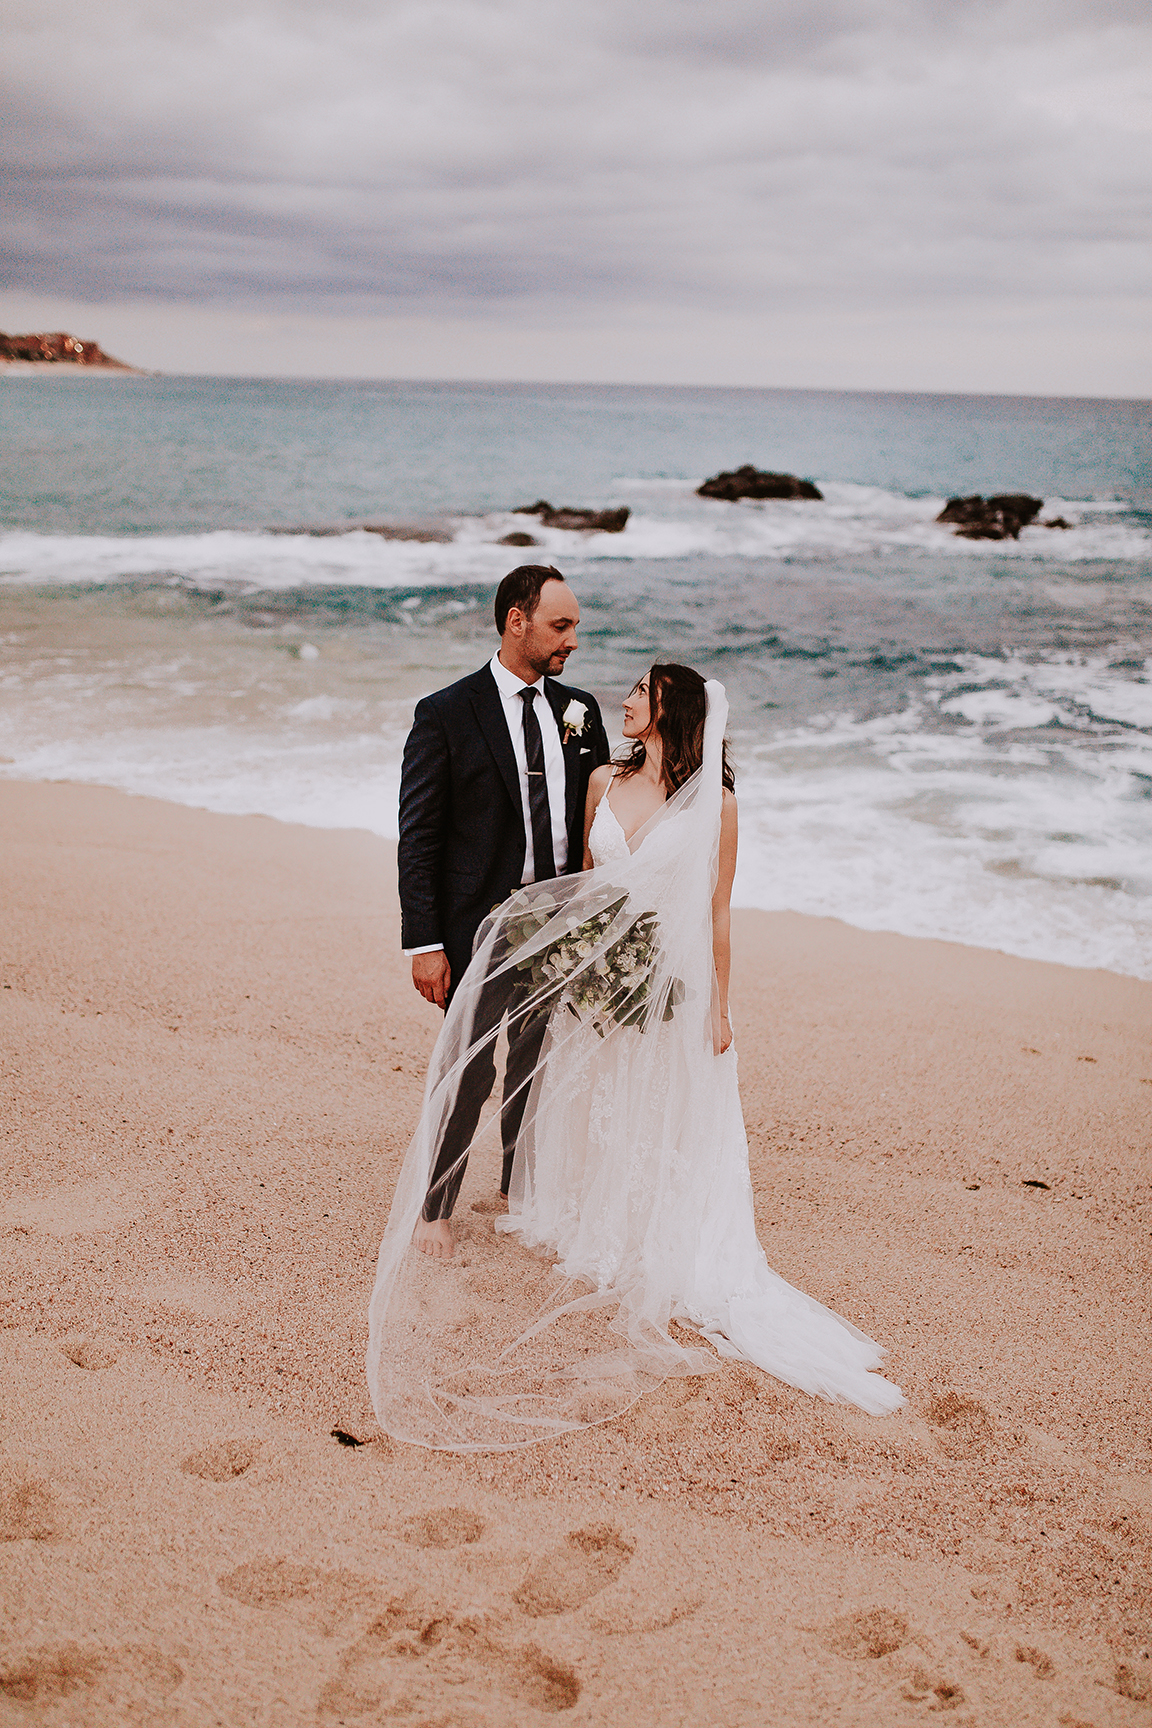 Lindsei+James_cabo_wedding_942.jpg